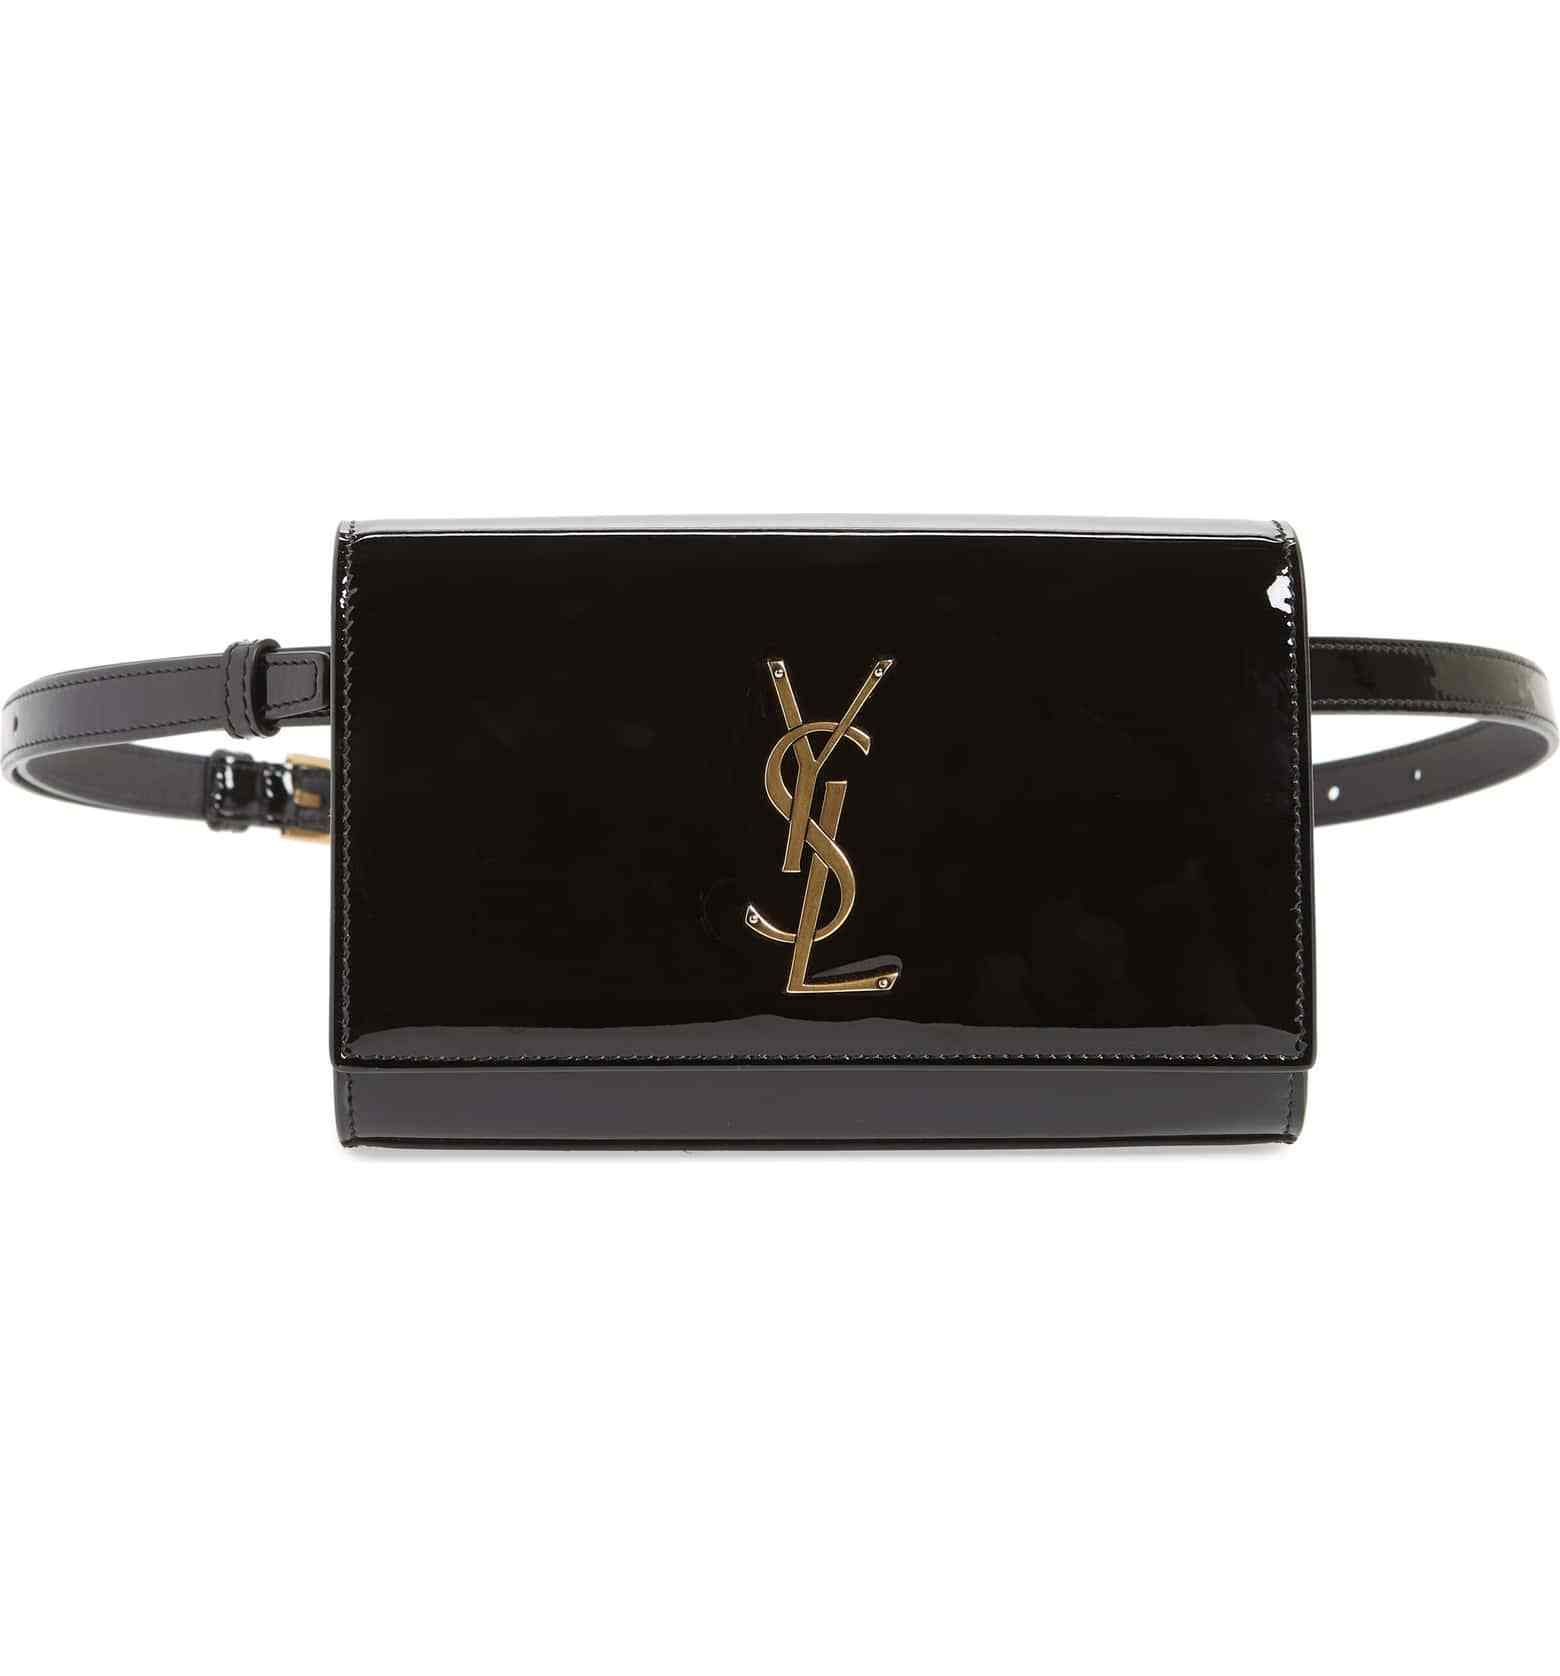 6a64224eb5c9 Saint Laurent Belt Bag Kate Patent  saintlaurent  beltbag  fannypack   designer  bag  ysl  shop  styleinspiration  shopping